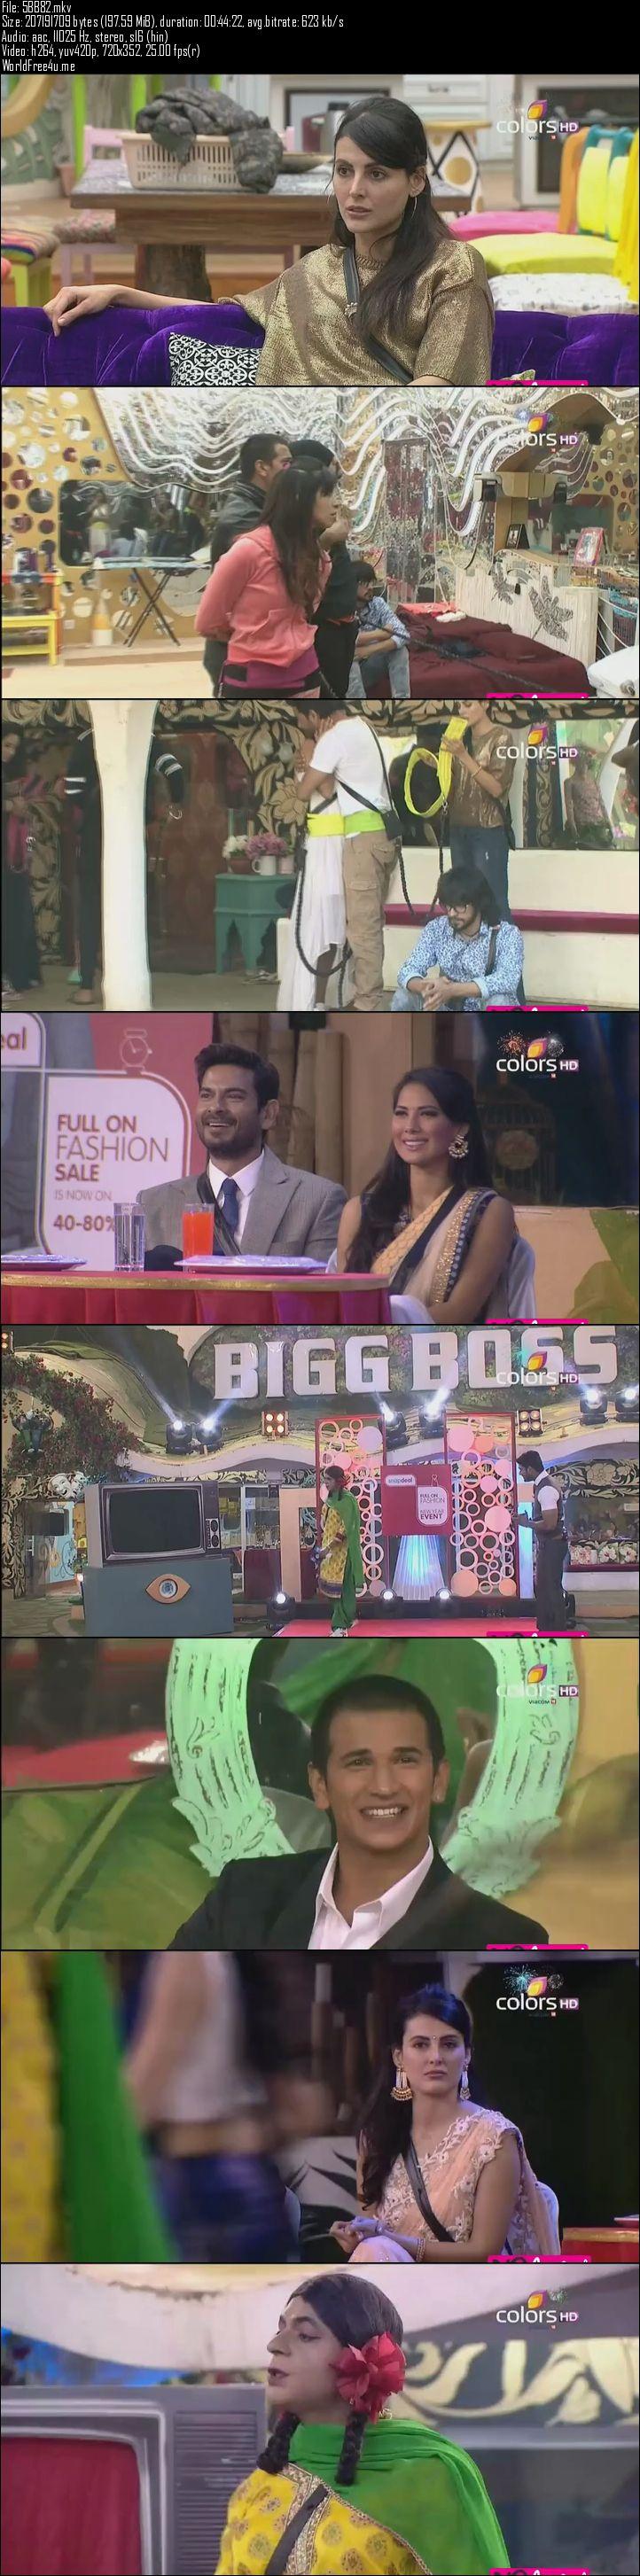 Screenshots Of Hindi Show Bigg Boss 9 31st December 2015 Episode 82 200MB 480P HD